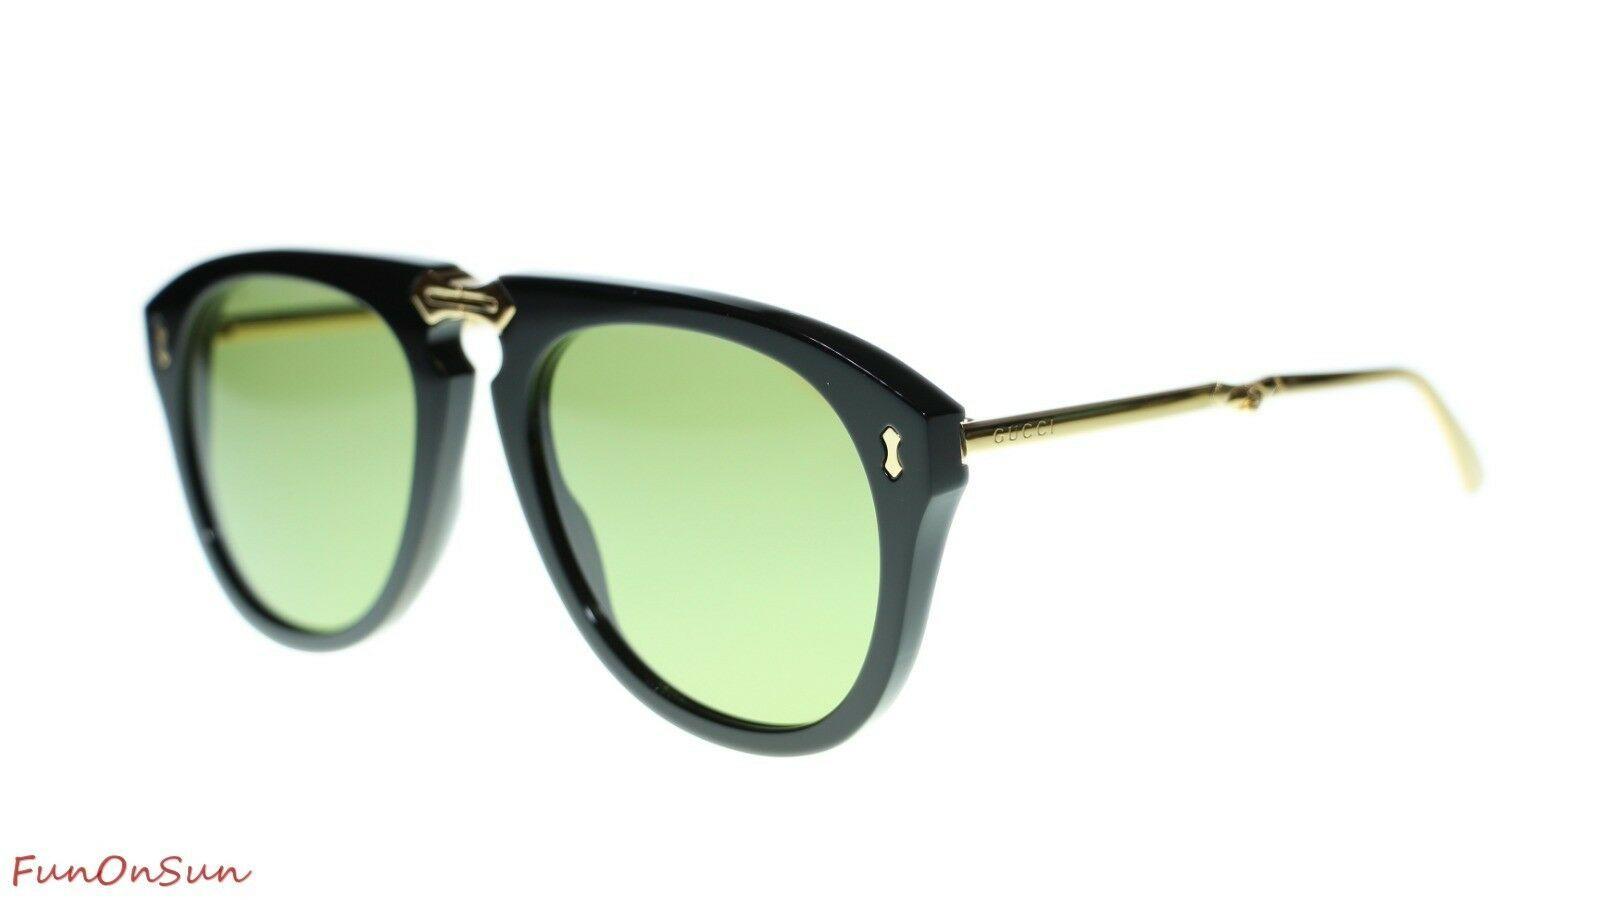 NEW Gucci Men's Sunglasses GG0305S 001 Black Gold Green Lens 56mm Authentic